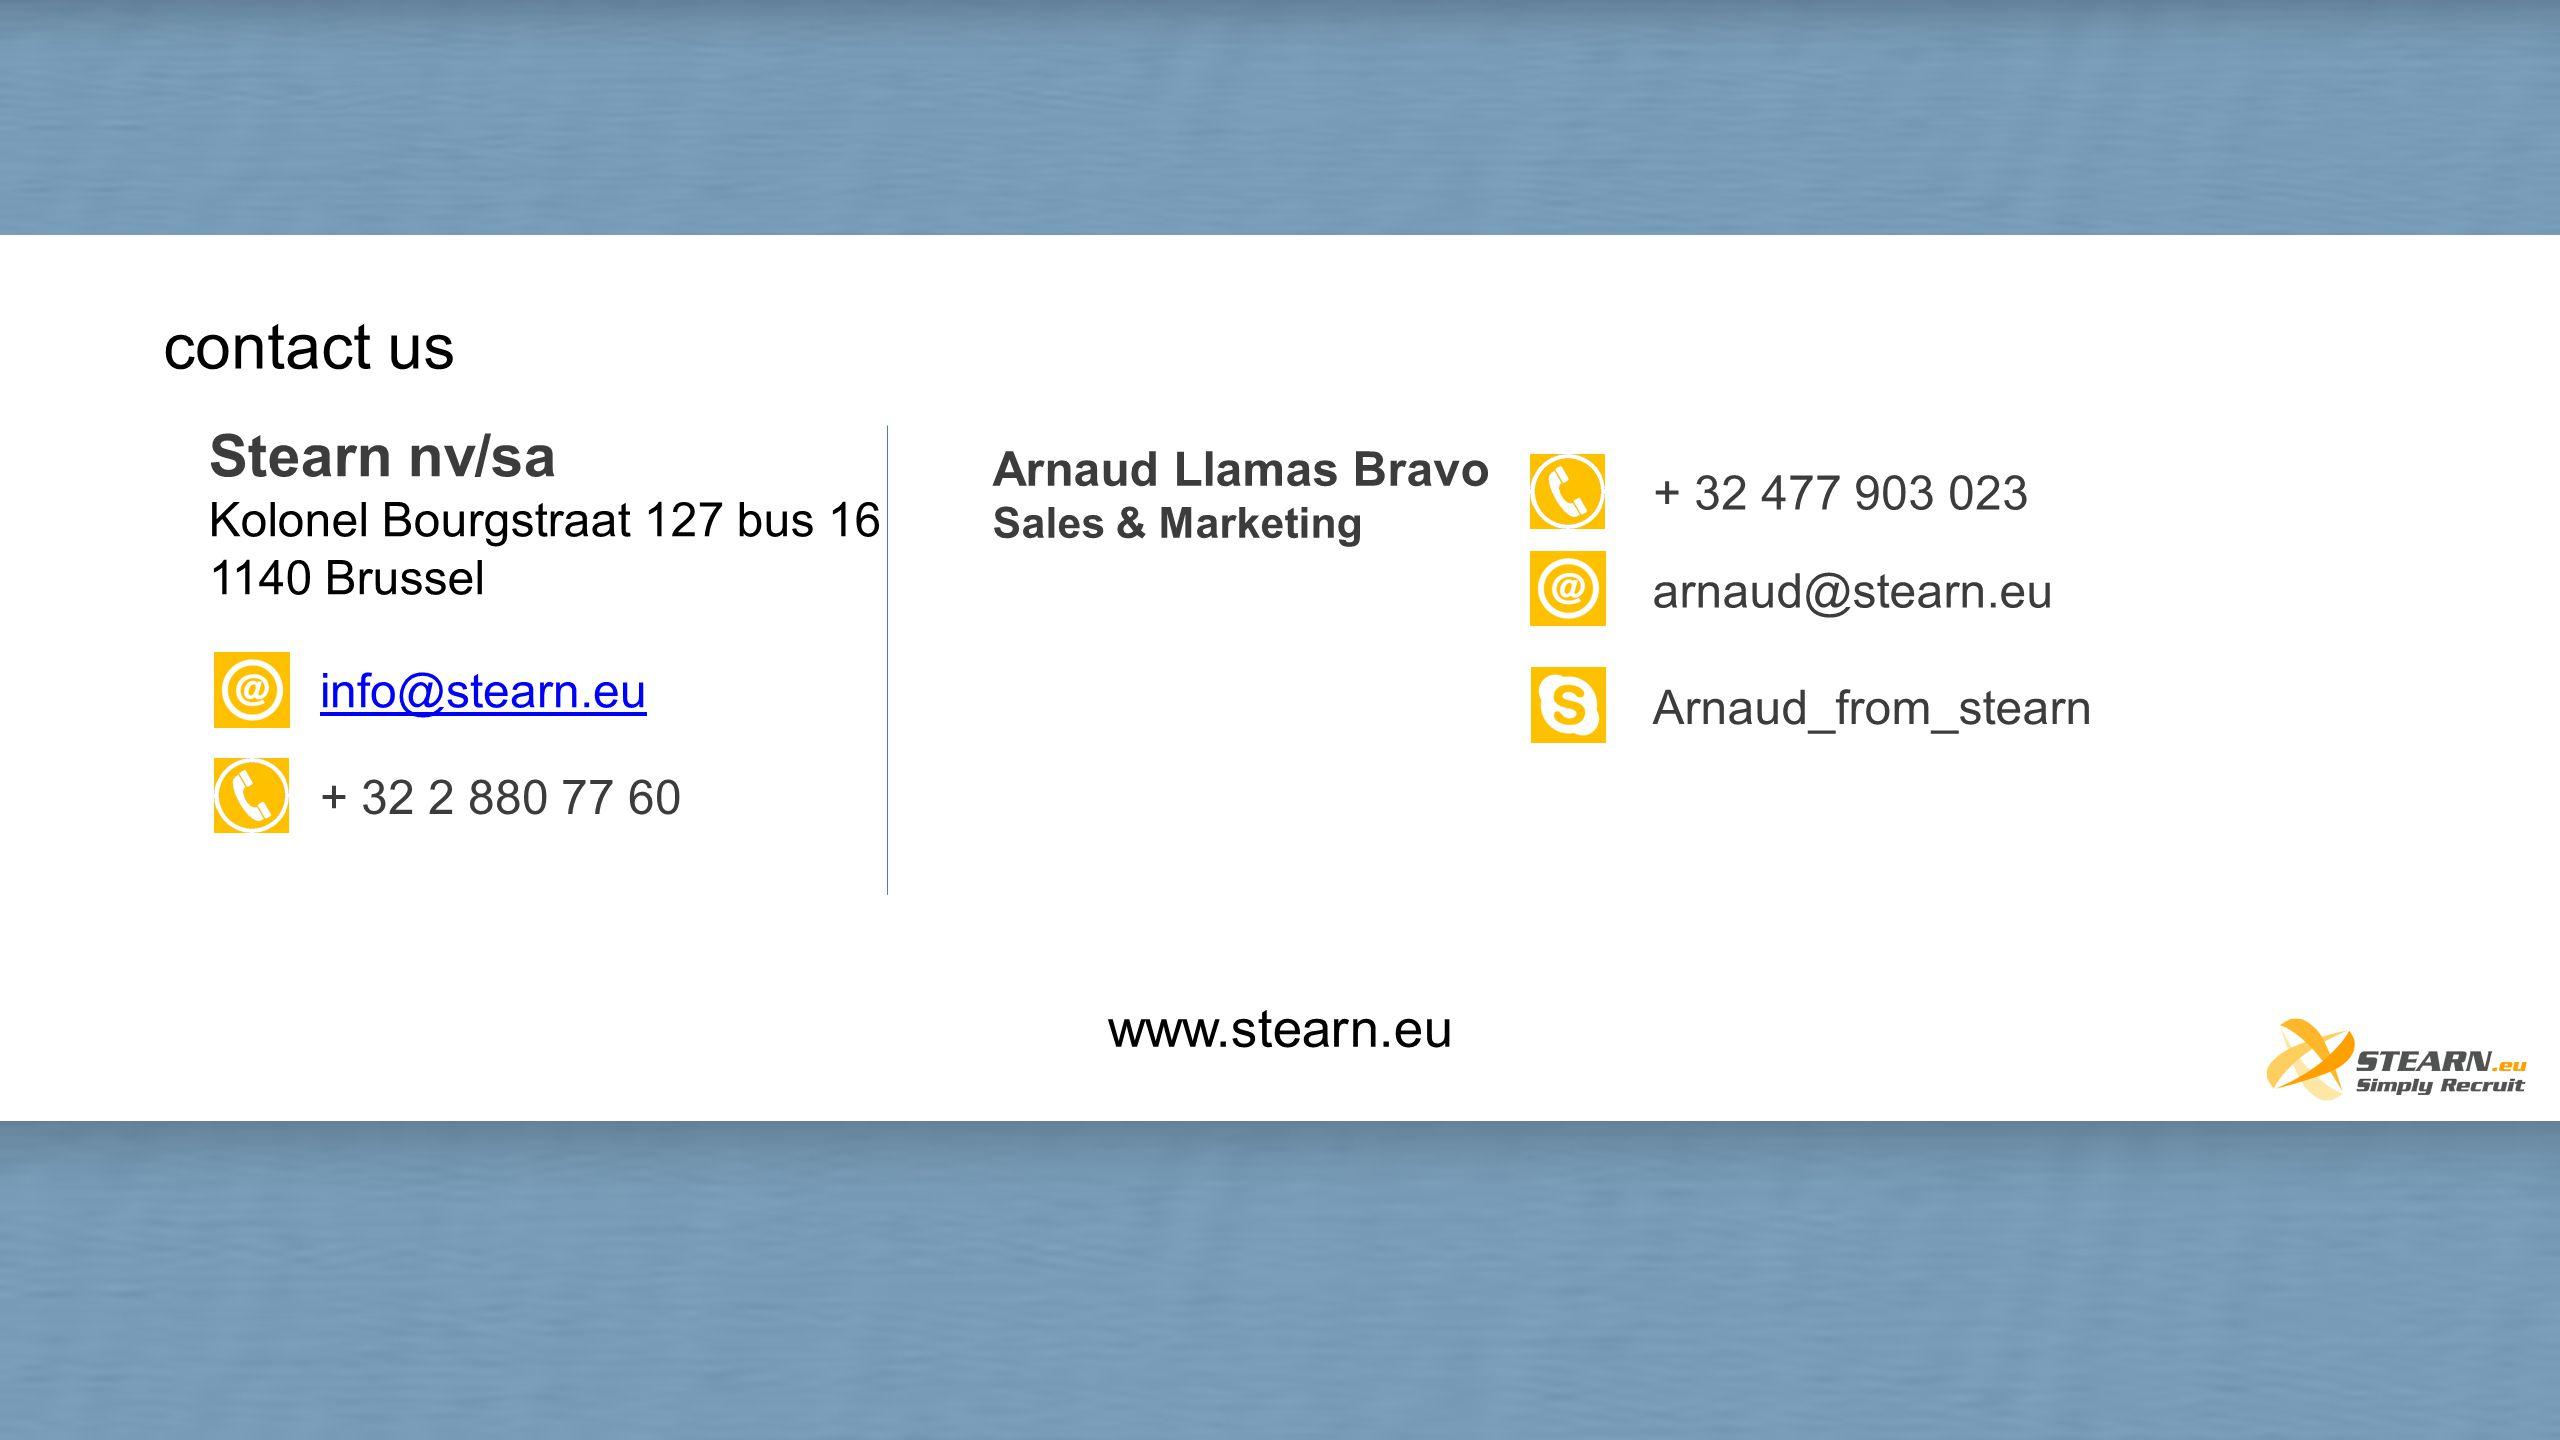 contact us Arnaud Llamas Bravo Sales & Marketing Arnaud_from_stearn arnaud@stearn.eu + 32 477 903 023 www.stearn.eu Stearn nv/sa Kolonel Bourgstraat 1